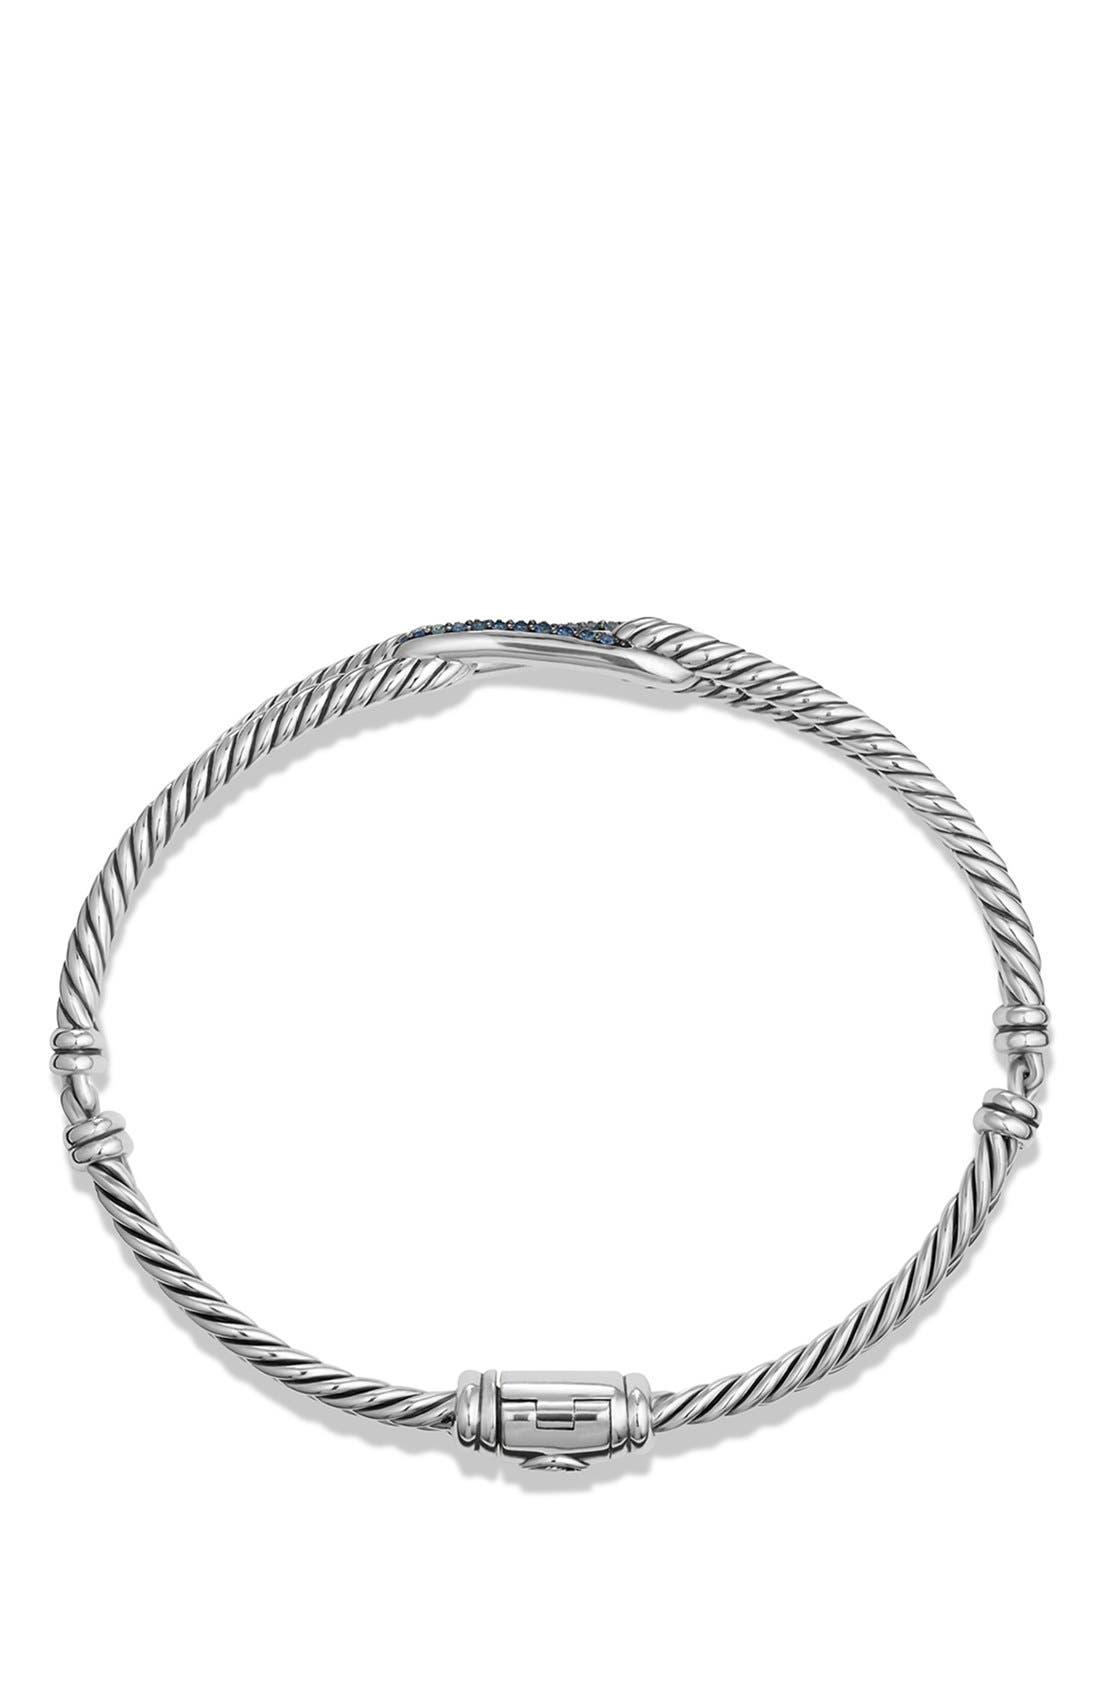 DAVID YURMAN,                             'Labyrinth' Petite Pavé Single-Loop Bracelet with Sapphires,                             Alternate thumbnail 2, color,                             BLUE SAPPHIRE